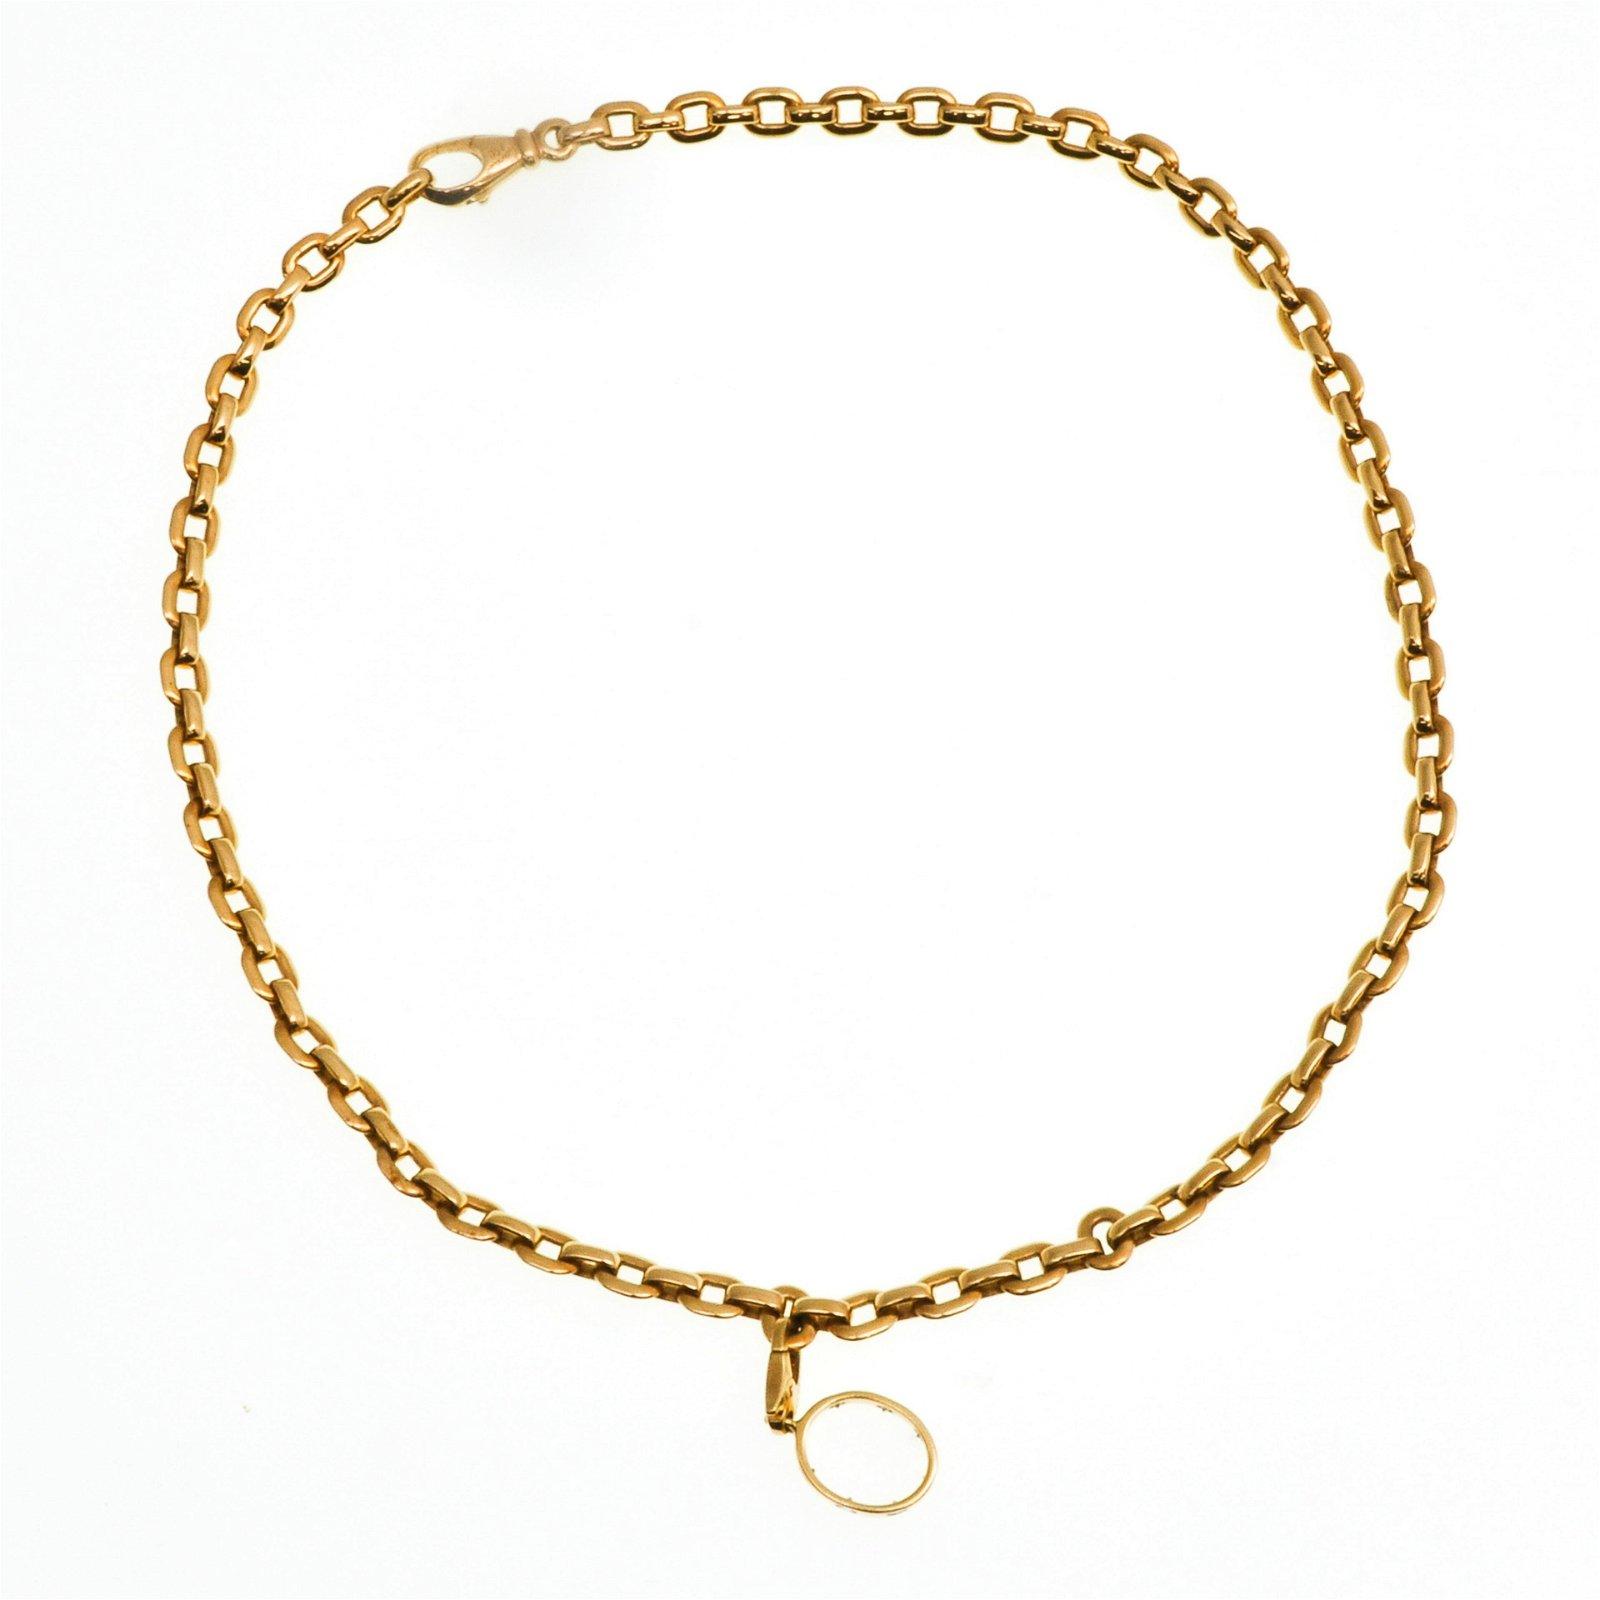 An 18KG Cartier Necklace with Diamond Pendant